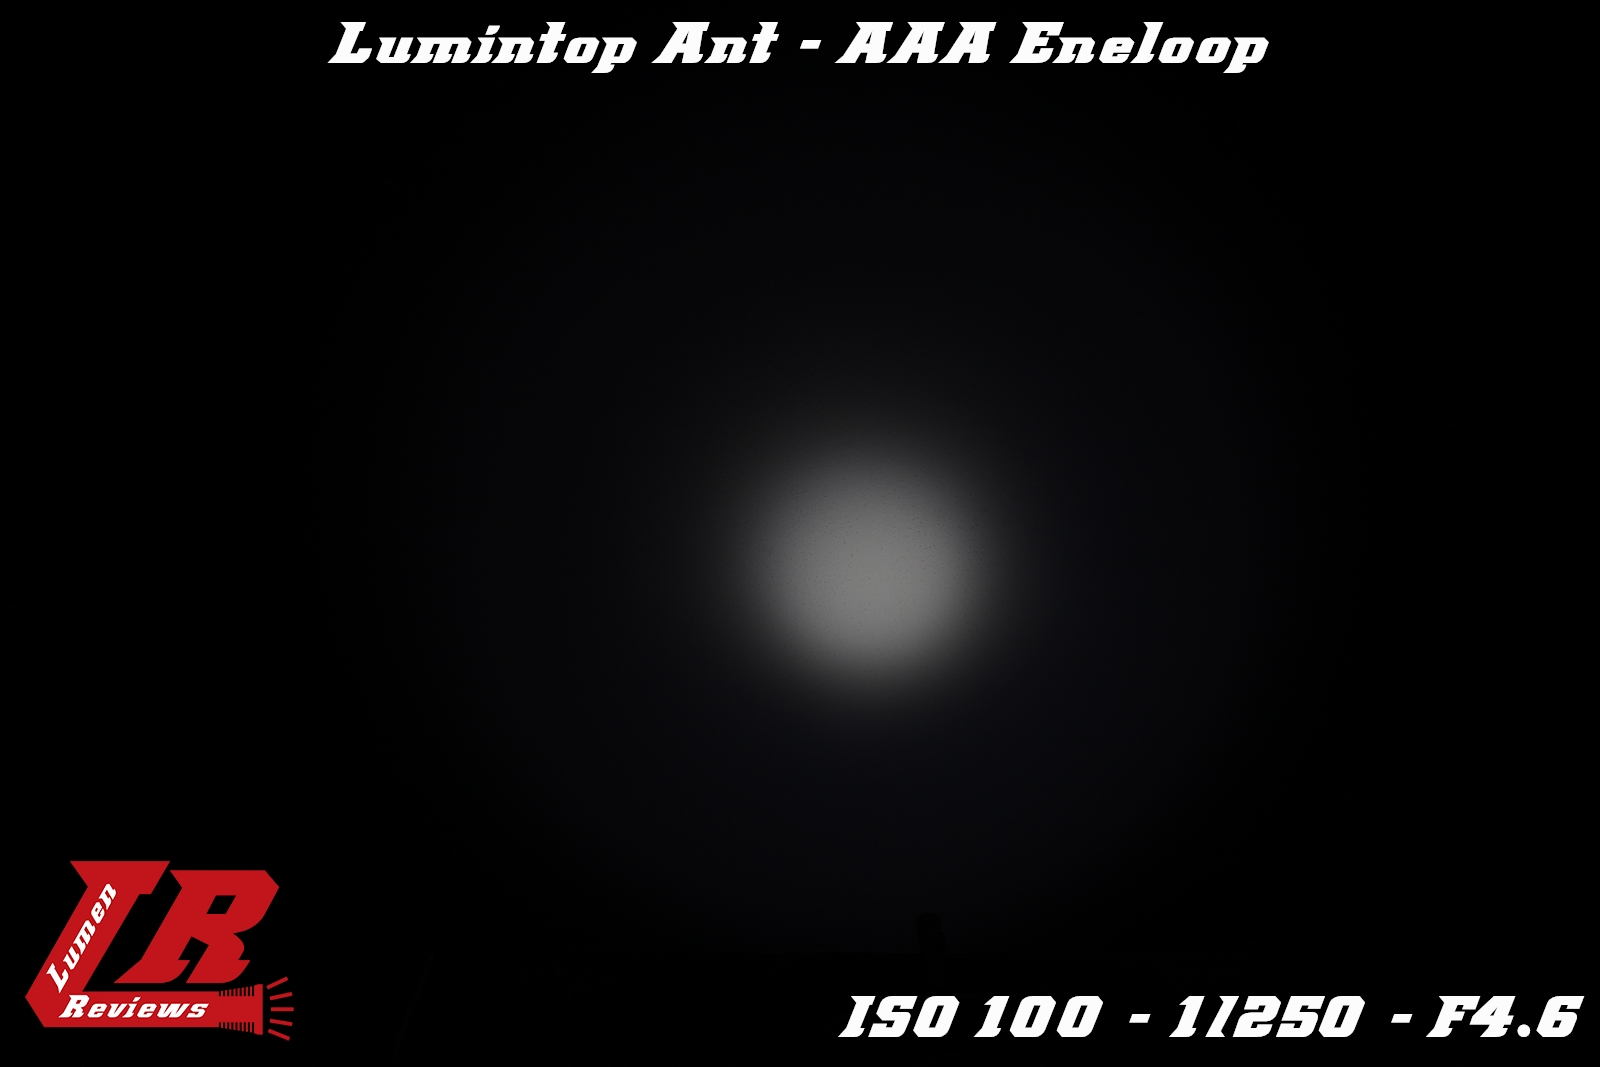 Lumintop Ant 28